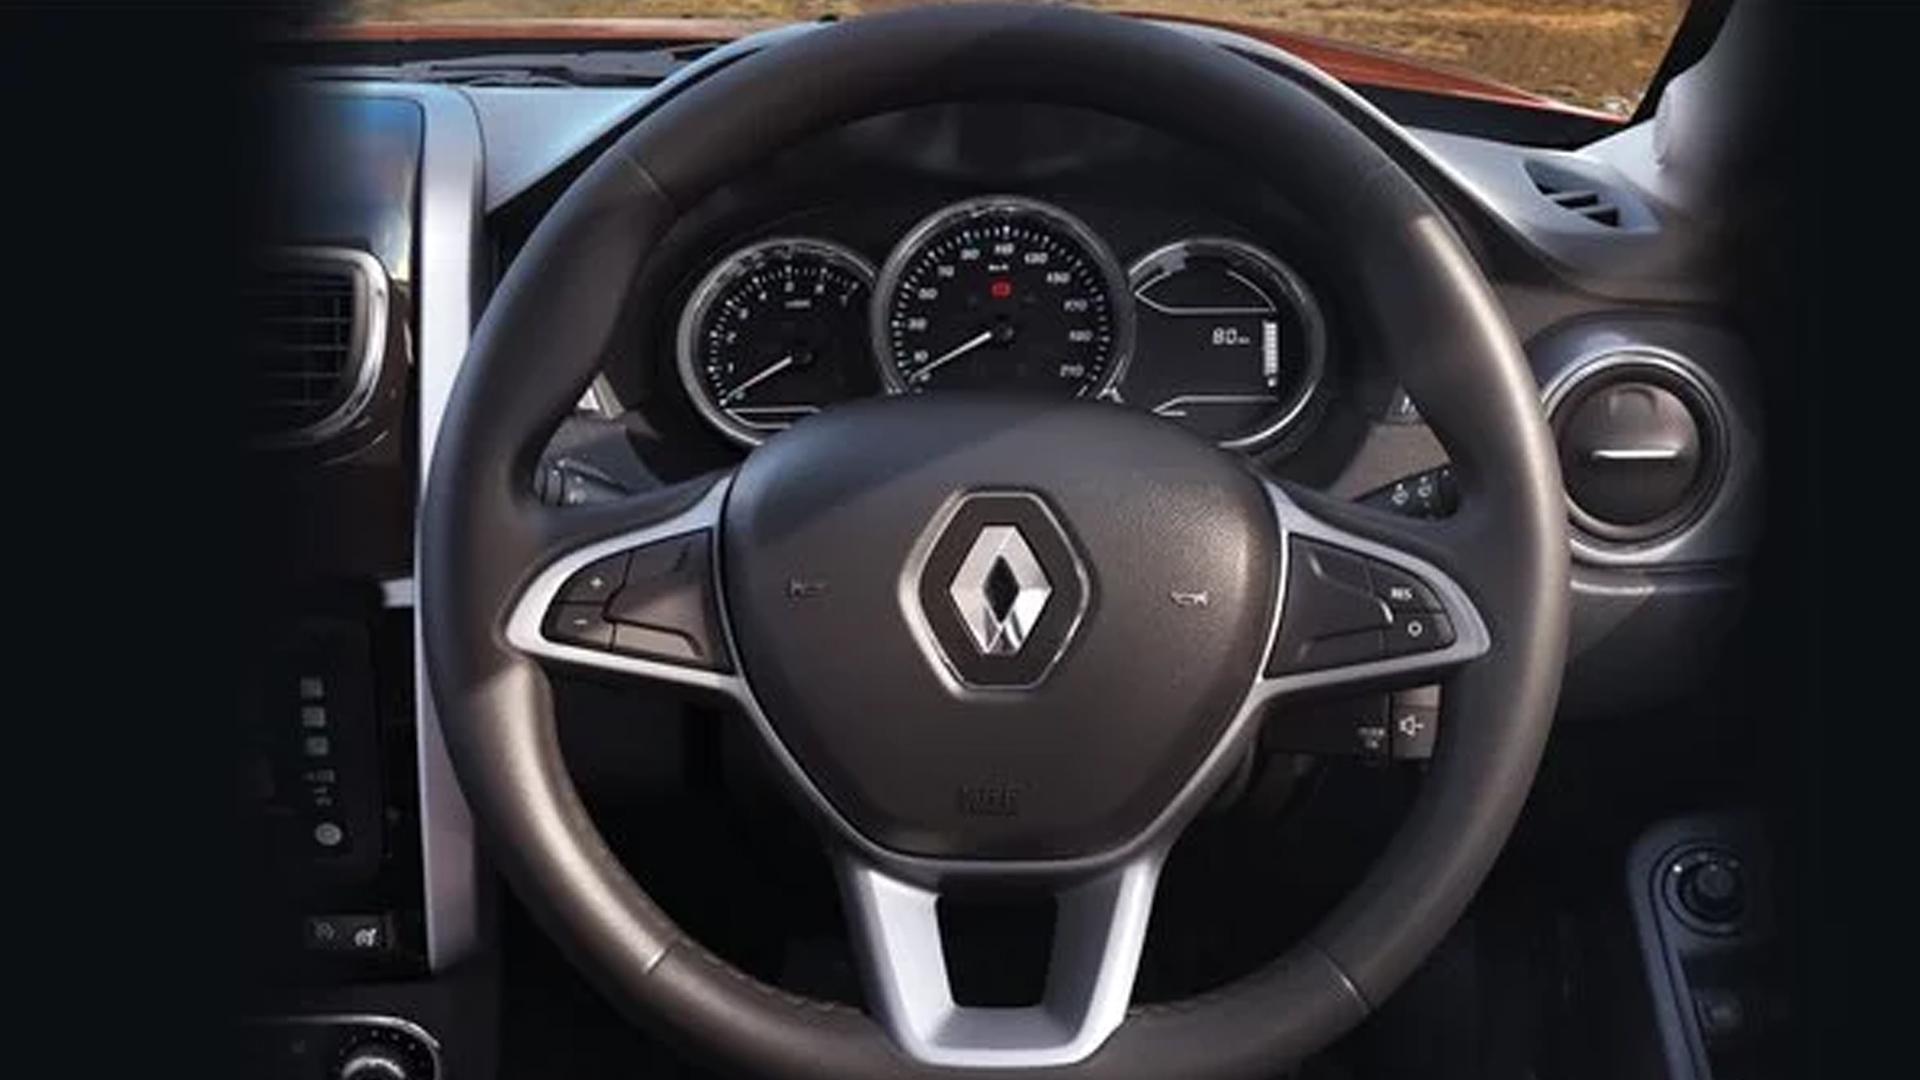 Renault Duster 2020 RXZ 1.3L Turbo X-Tronic Exterior